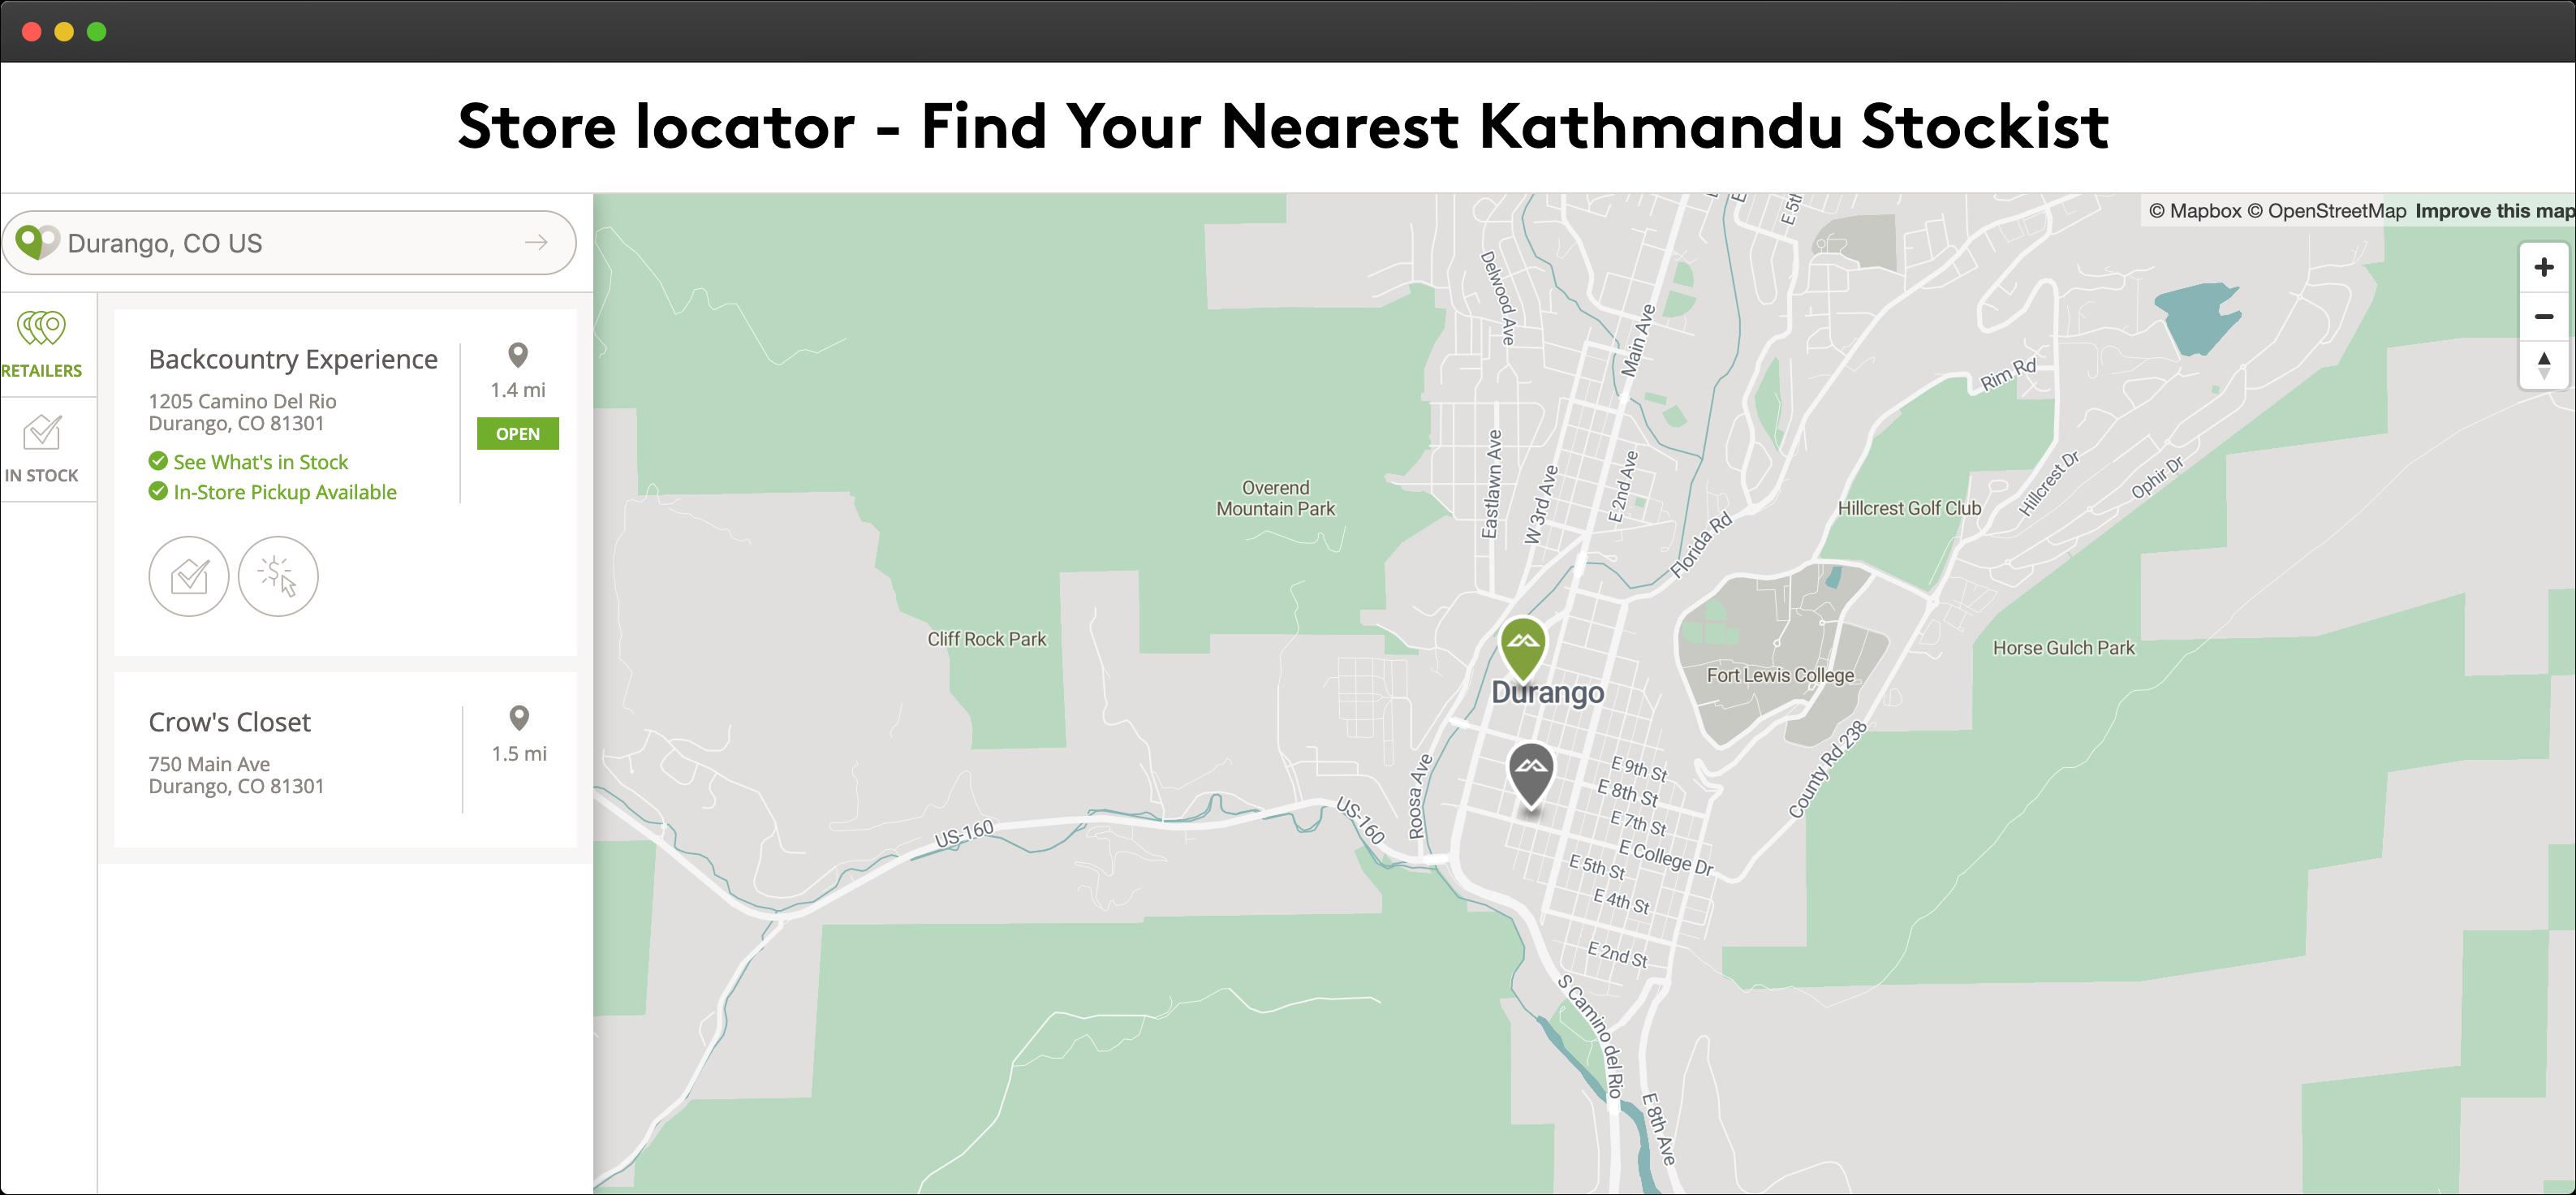 Kathmandu Store Locator